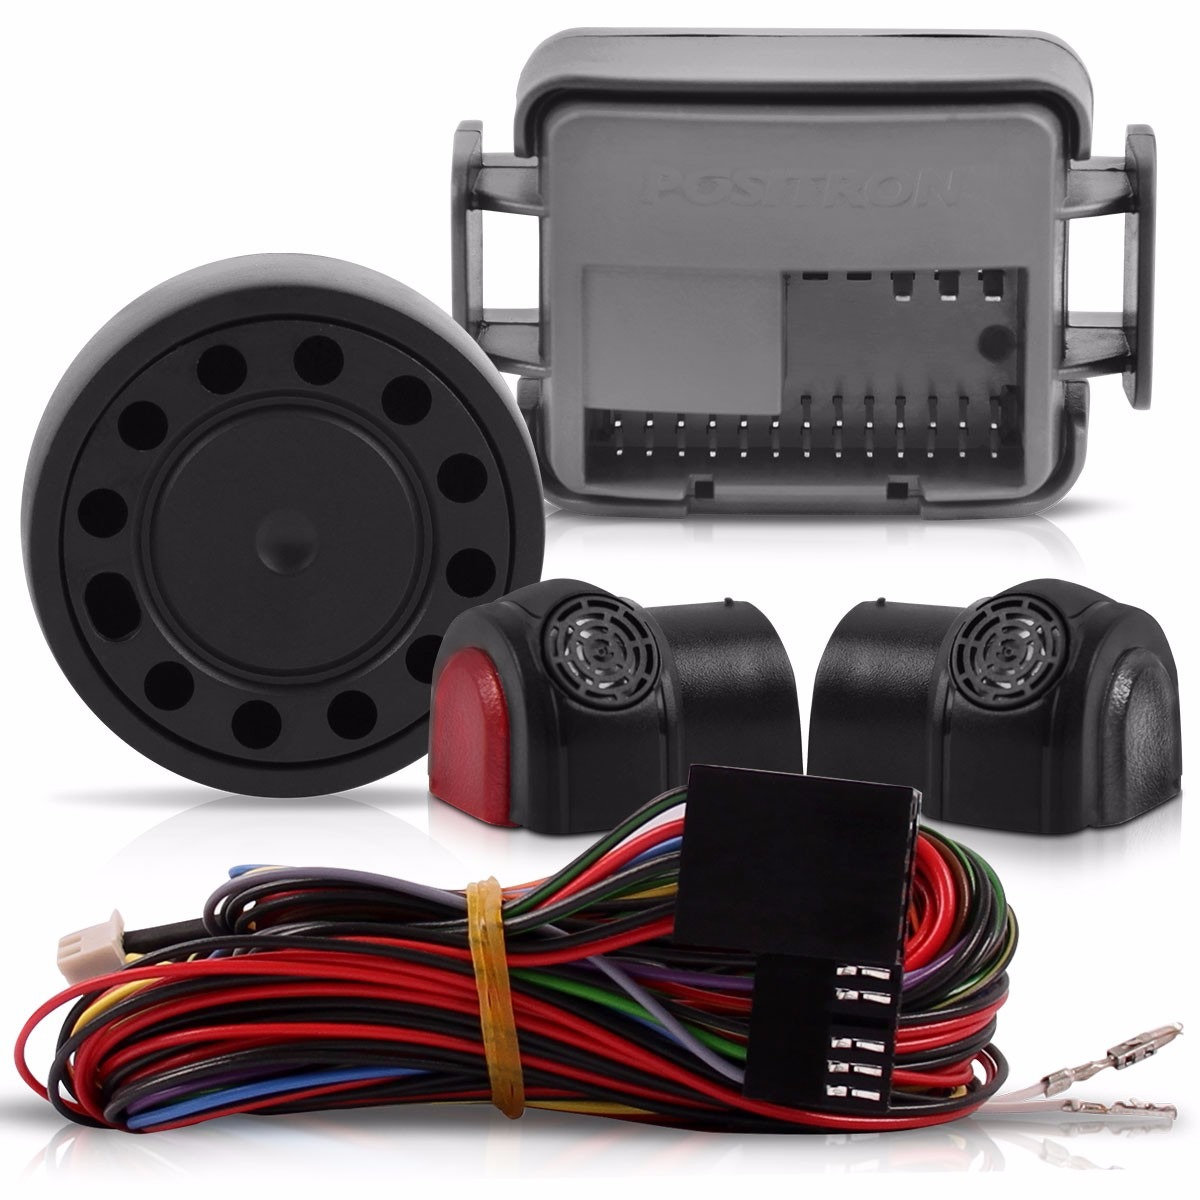 alarme automotivo cyber px330 com sensor de presen a p sitron. Black Bedroom Furniture Sets. Home Design Ideas